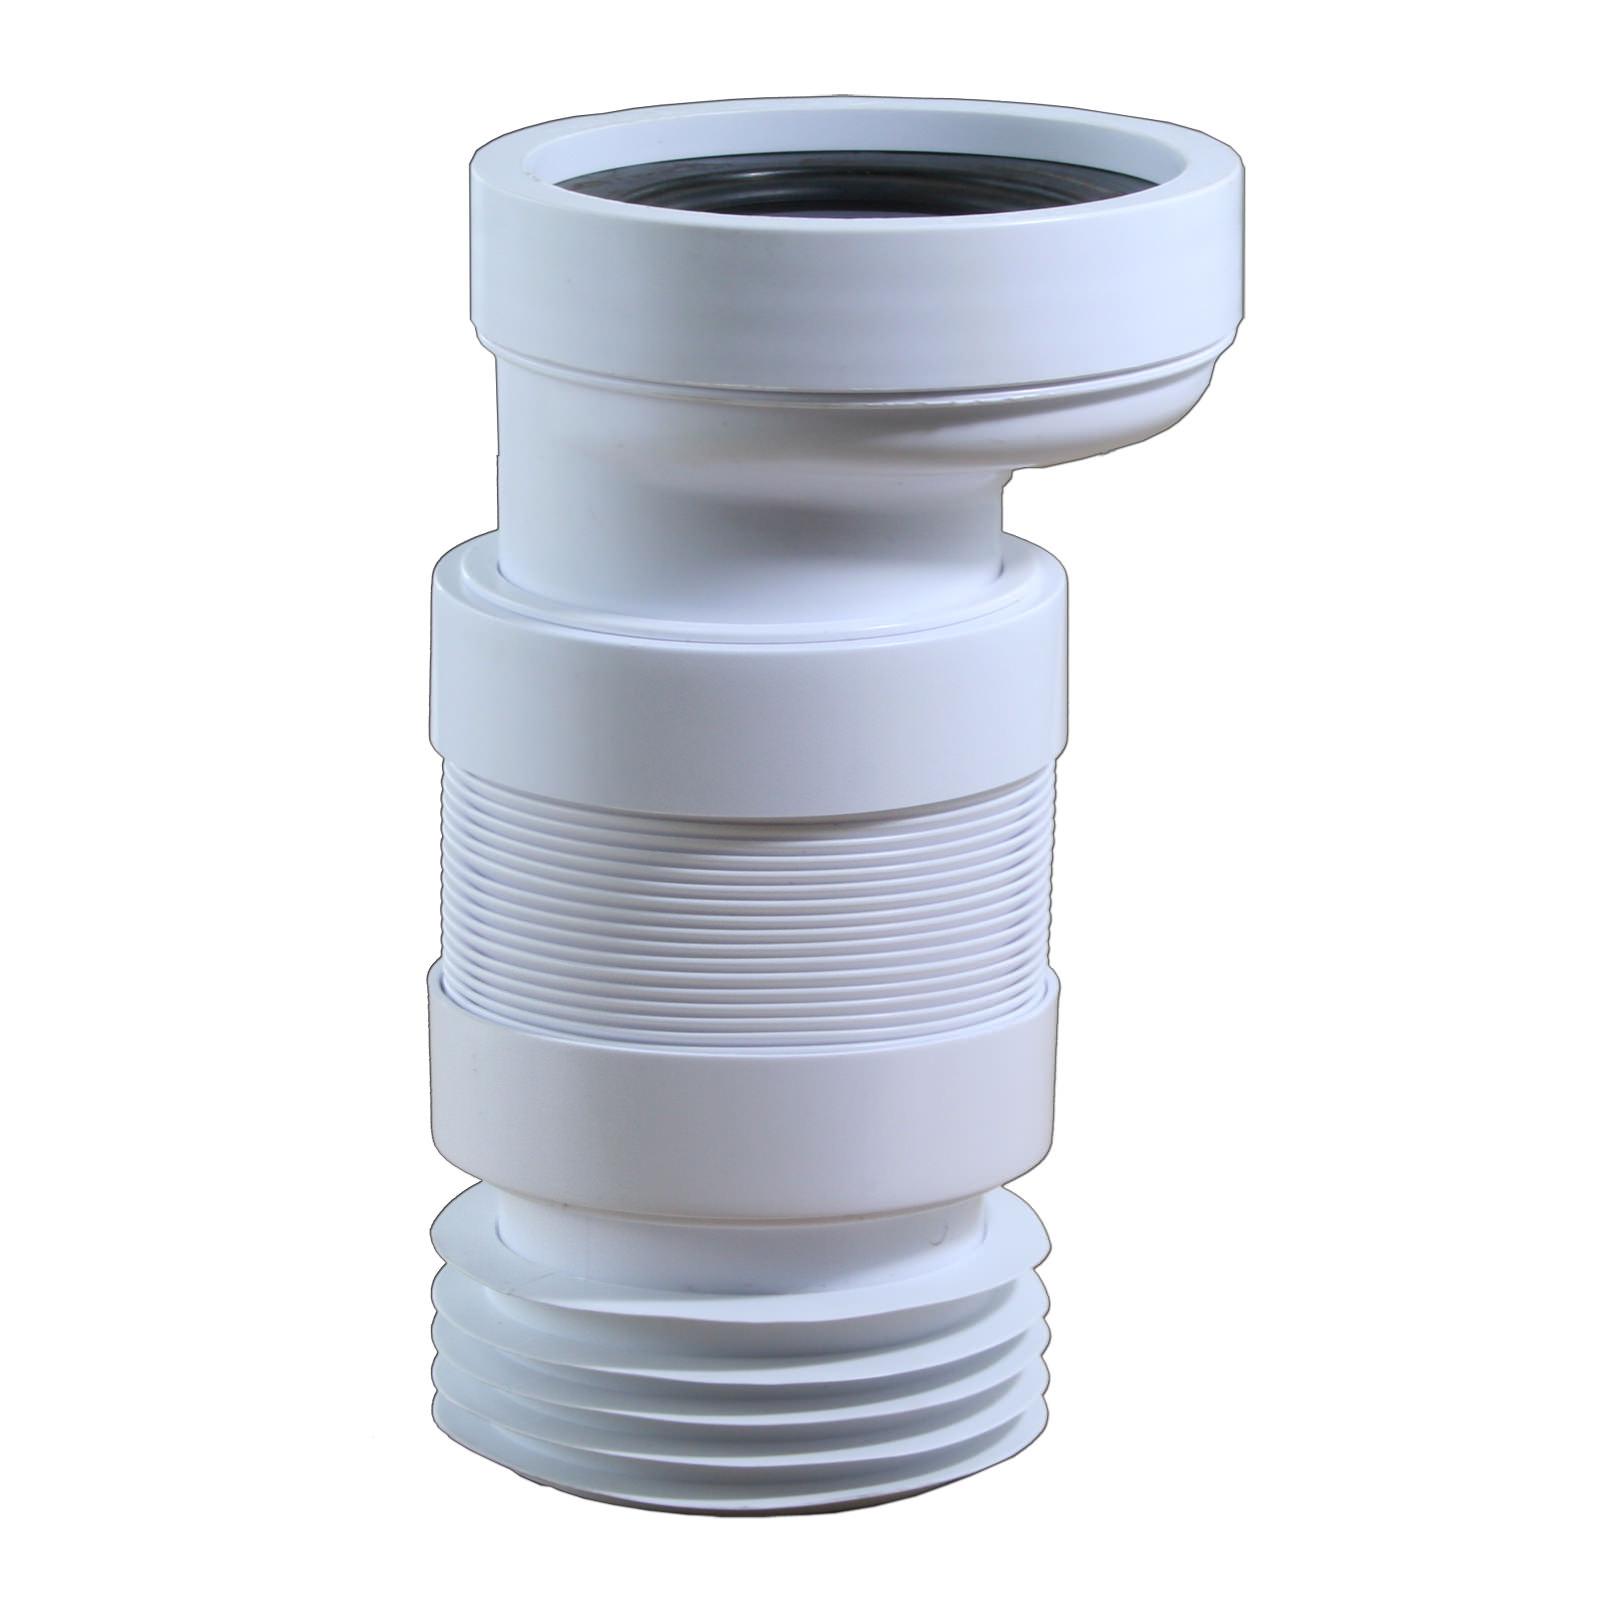 flexible wc anschluss dn 100 2 cm versatz sanitaer. Black Bedroom Furniture Sets. Home Design Ideas